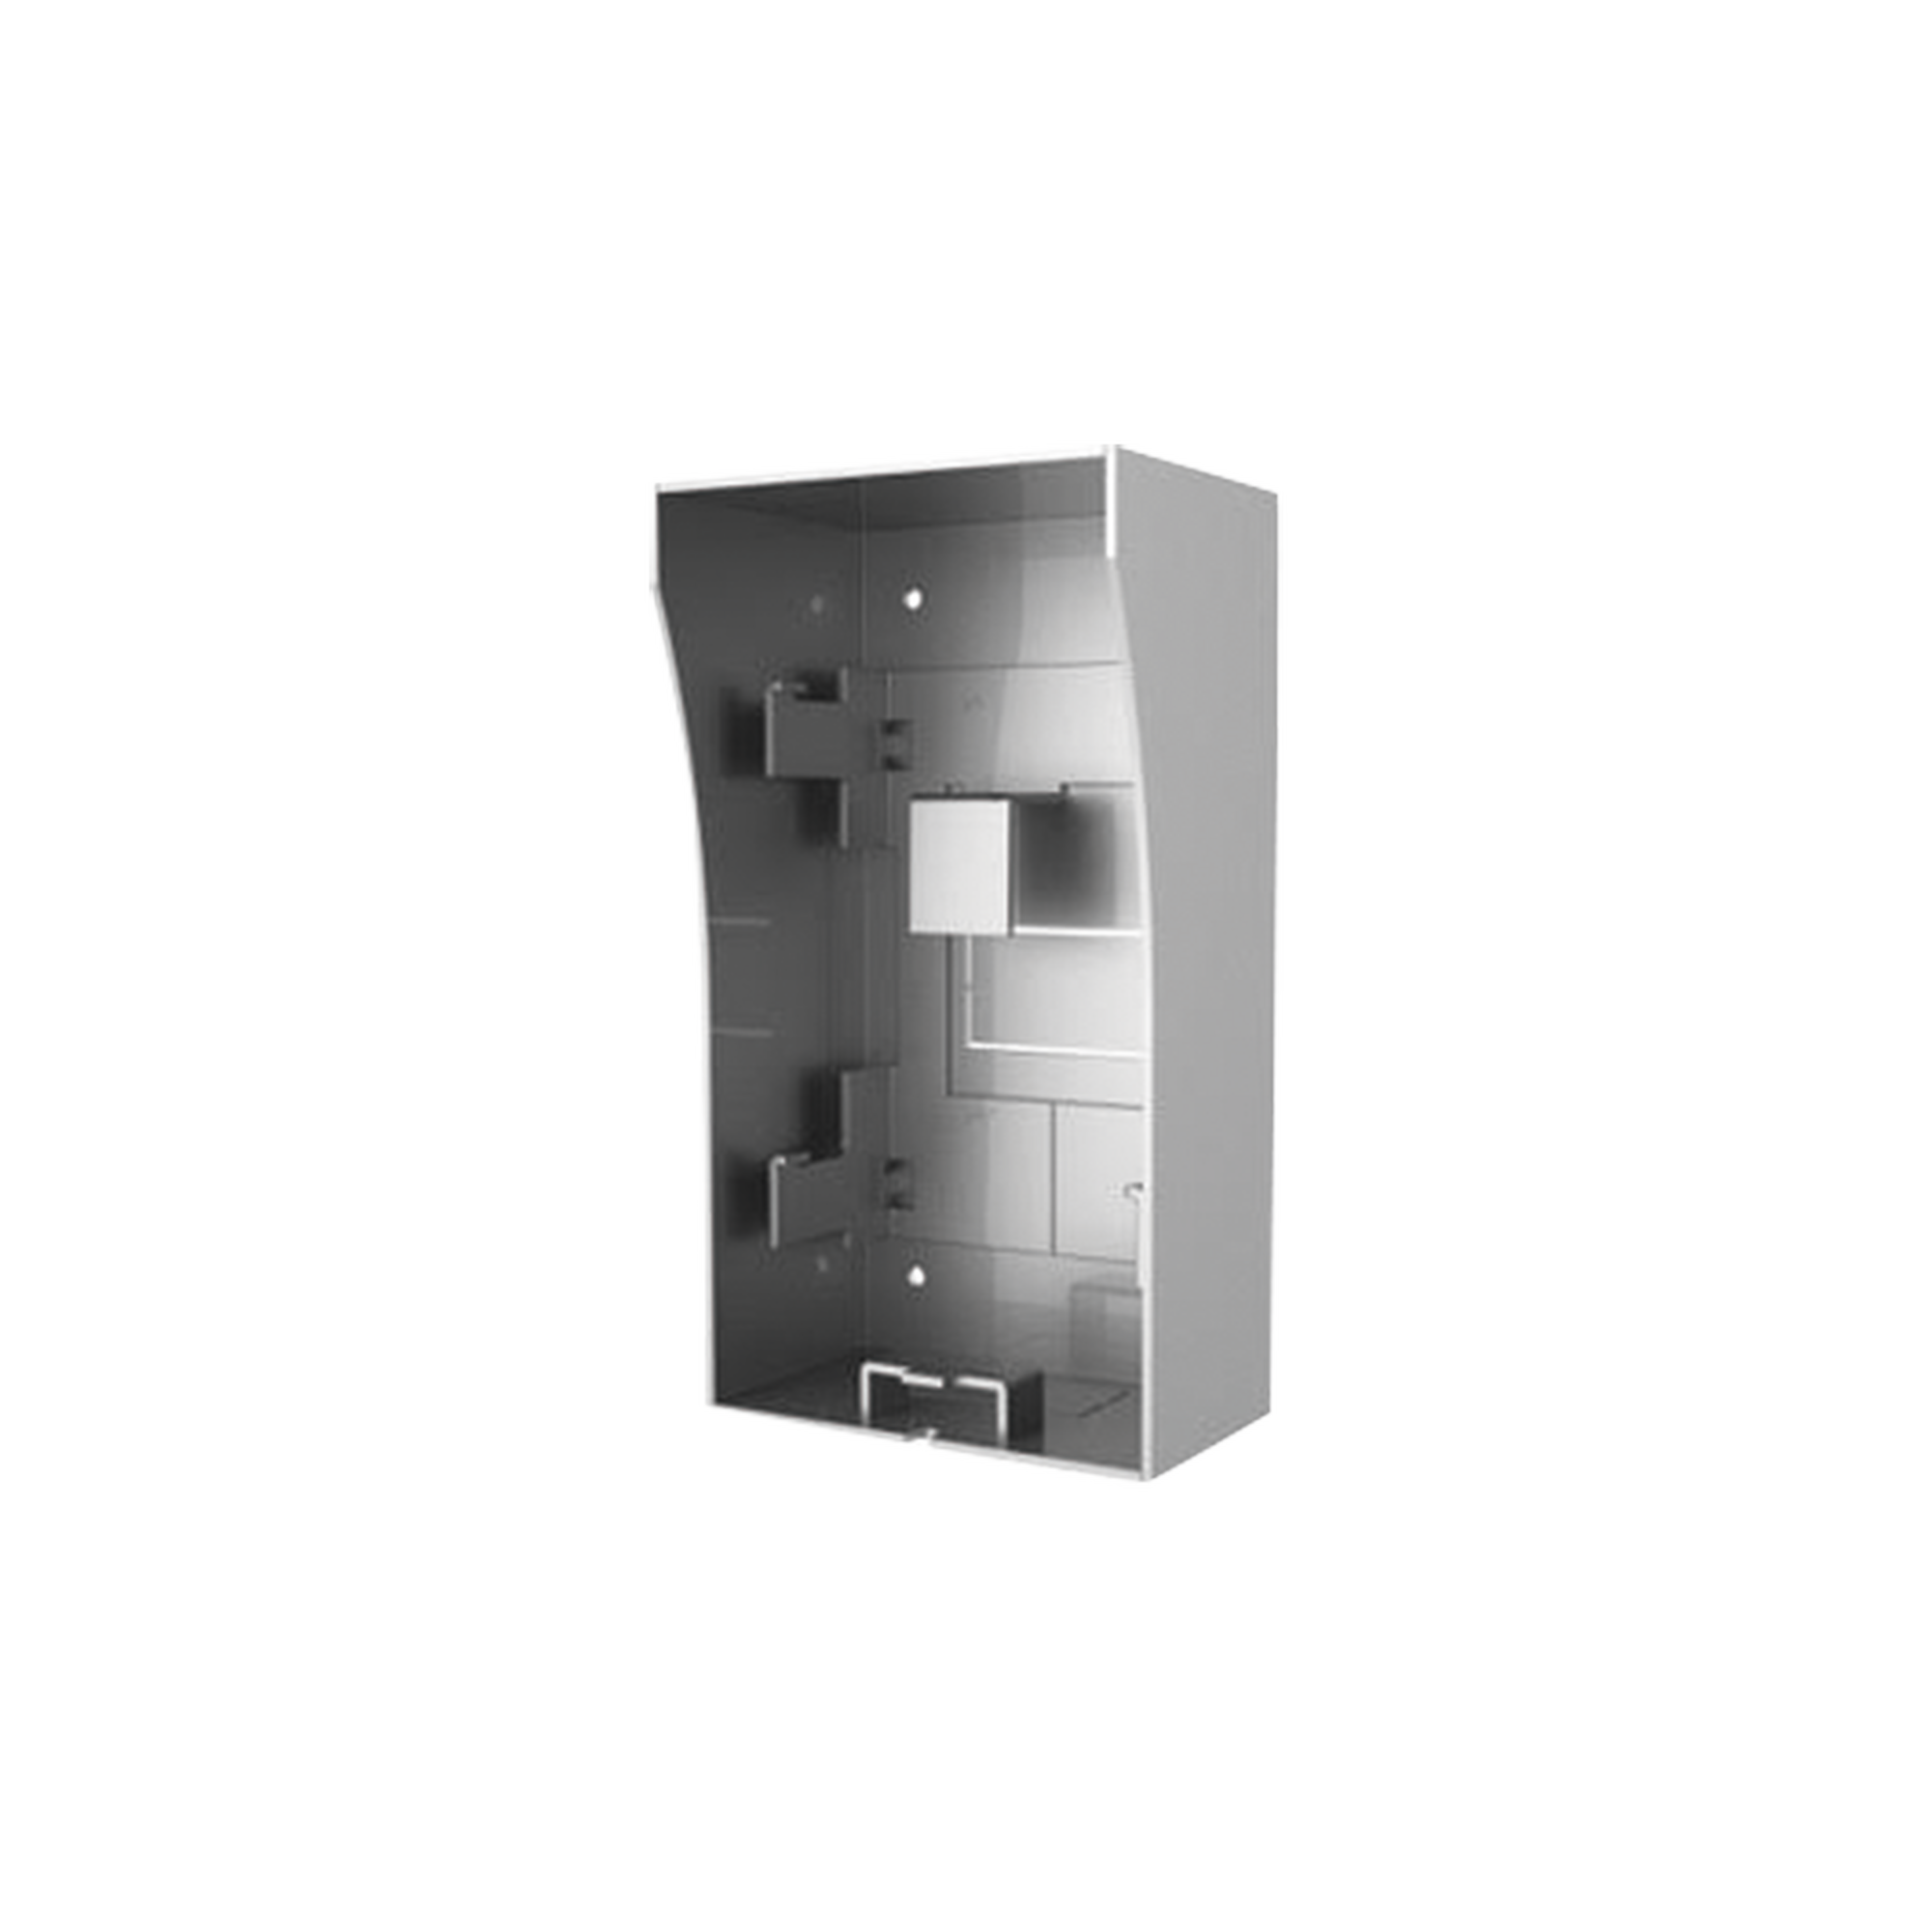 Montaje de Pared para Frentes de Calle DS-KV8X02-IM / Accesorio opcional para mejor instalación